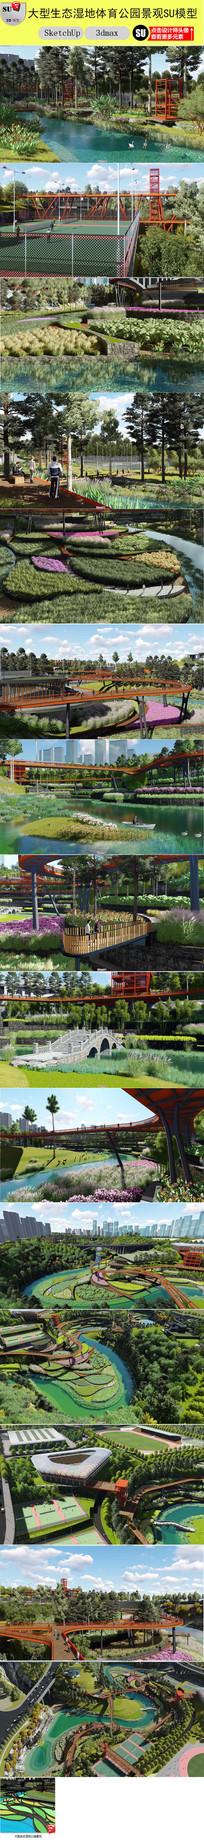 su大型生态湿地体育公园景观